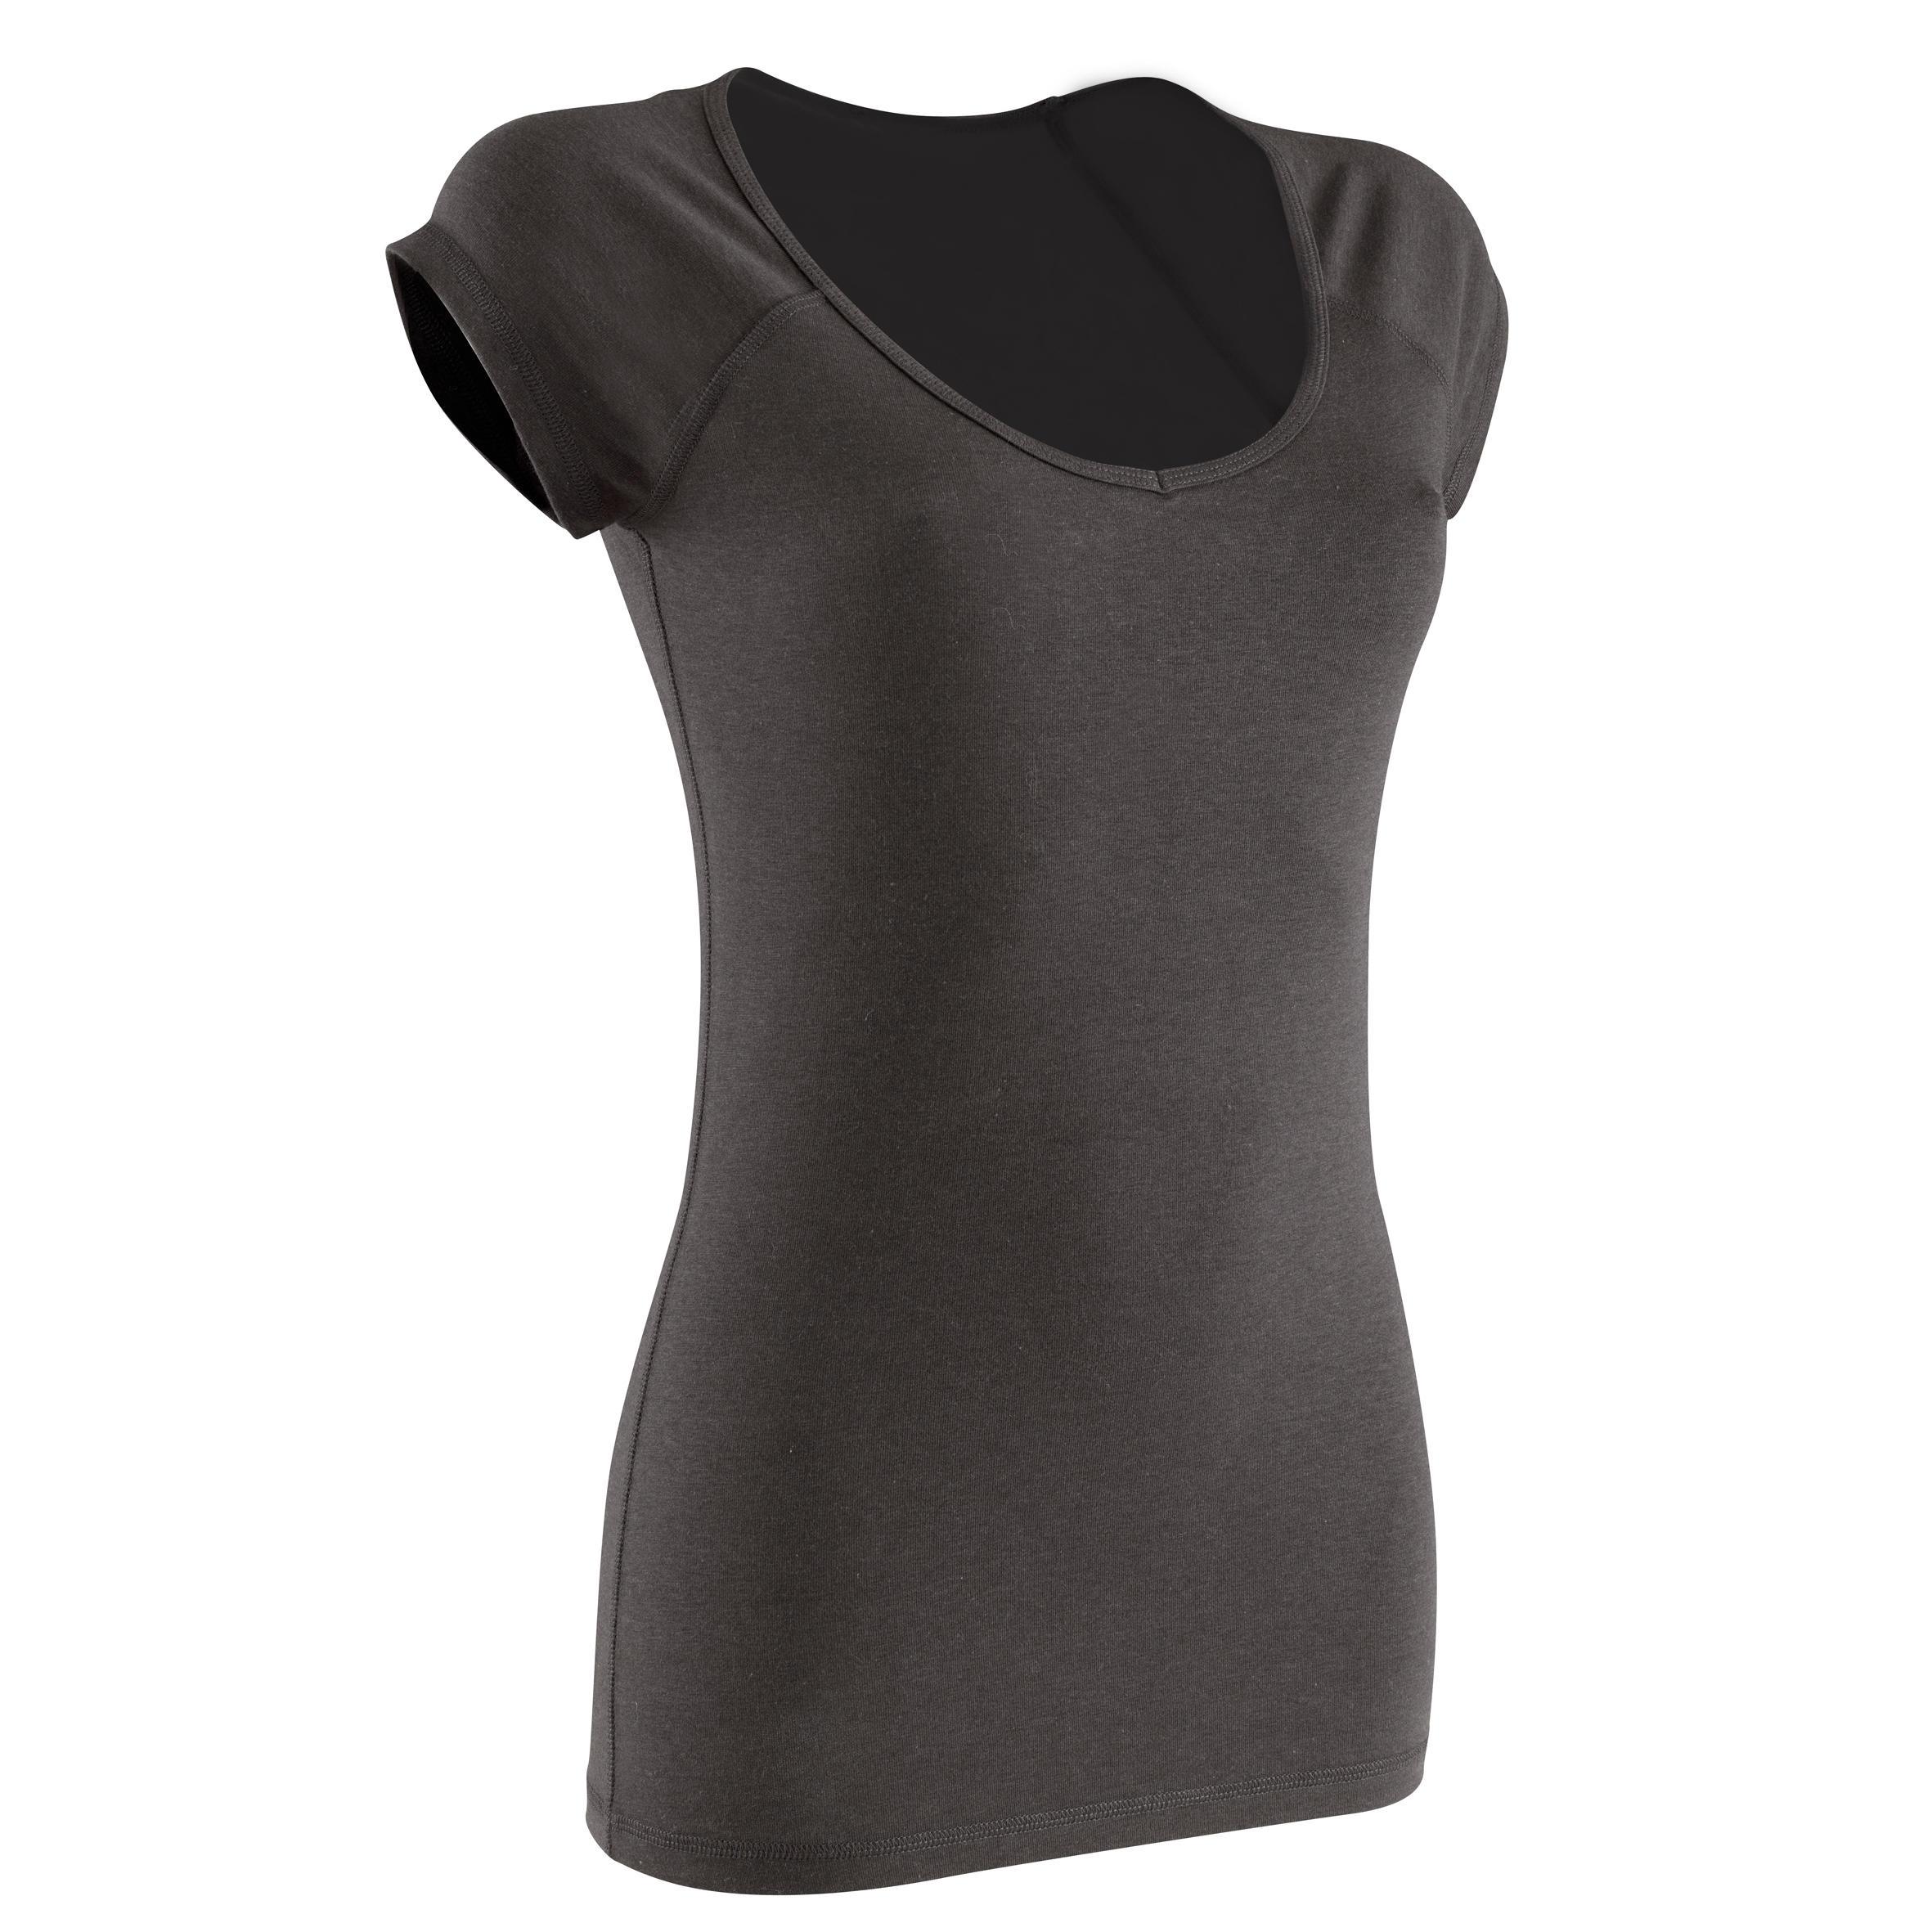 500 Women's Slim-Fit Gentle Gym & Pilates T-Shirt - Black